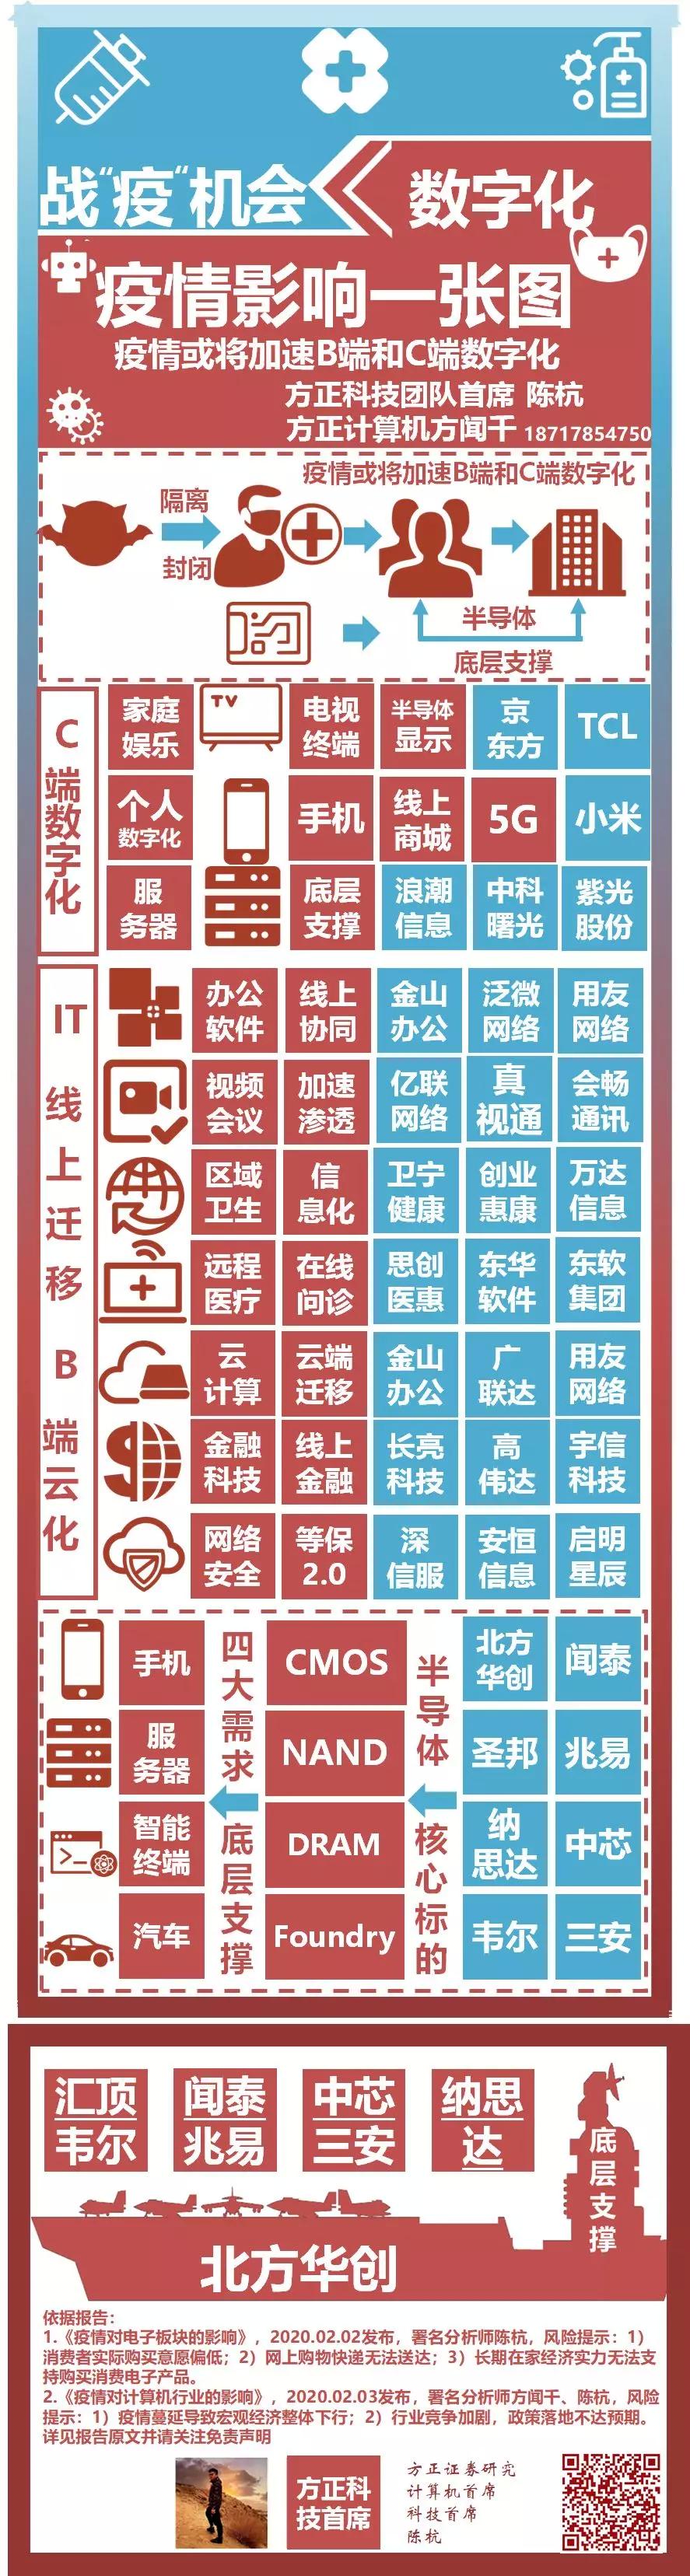 http://www.reviewcode.cn/yanfaguanli/115981.html